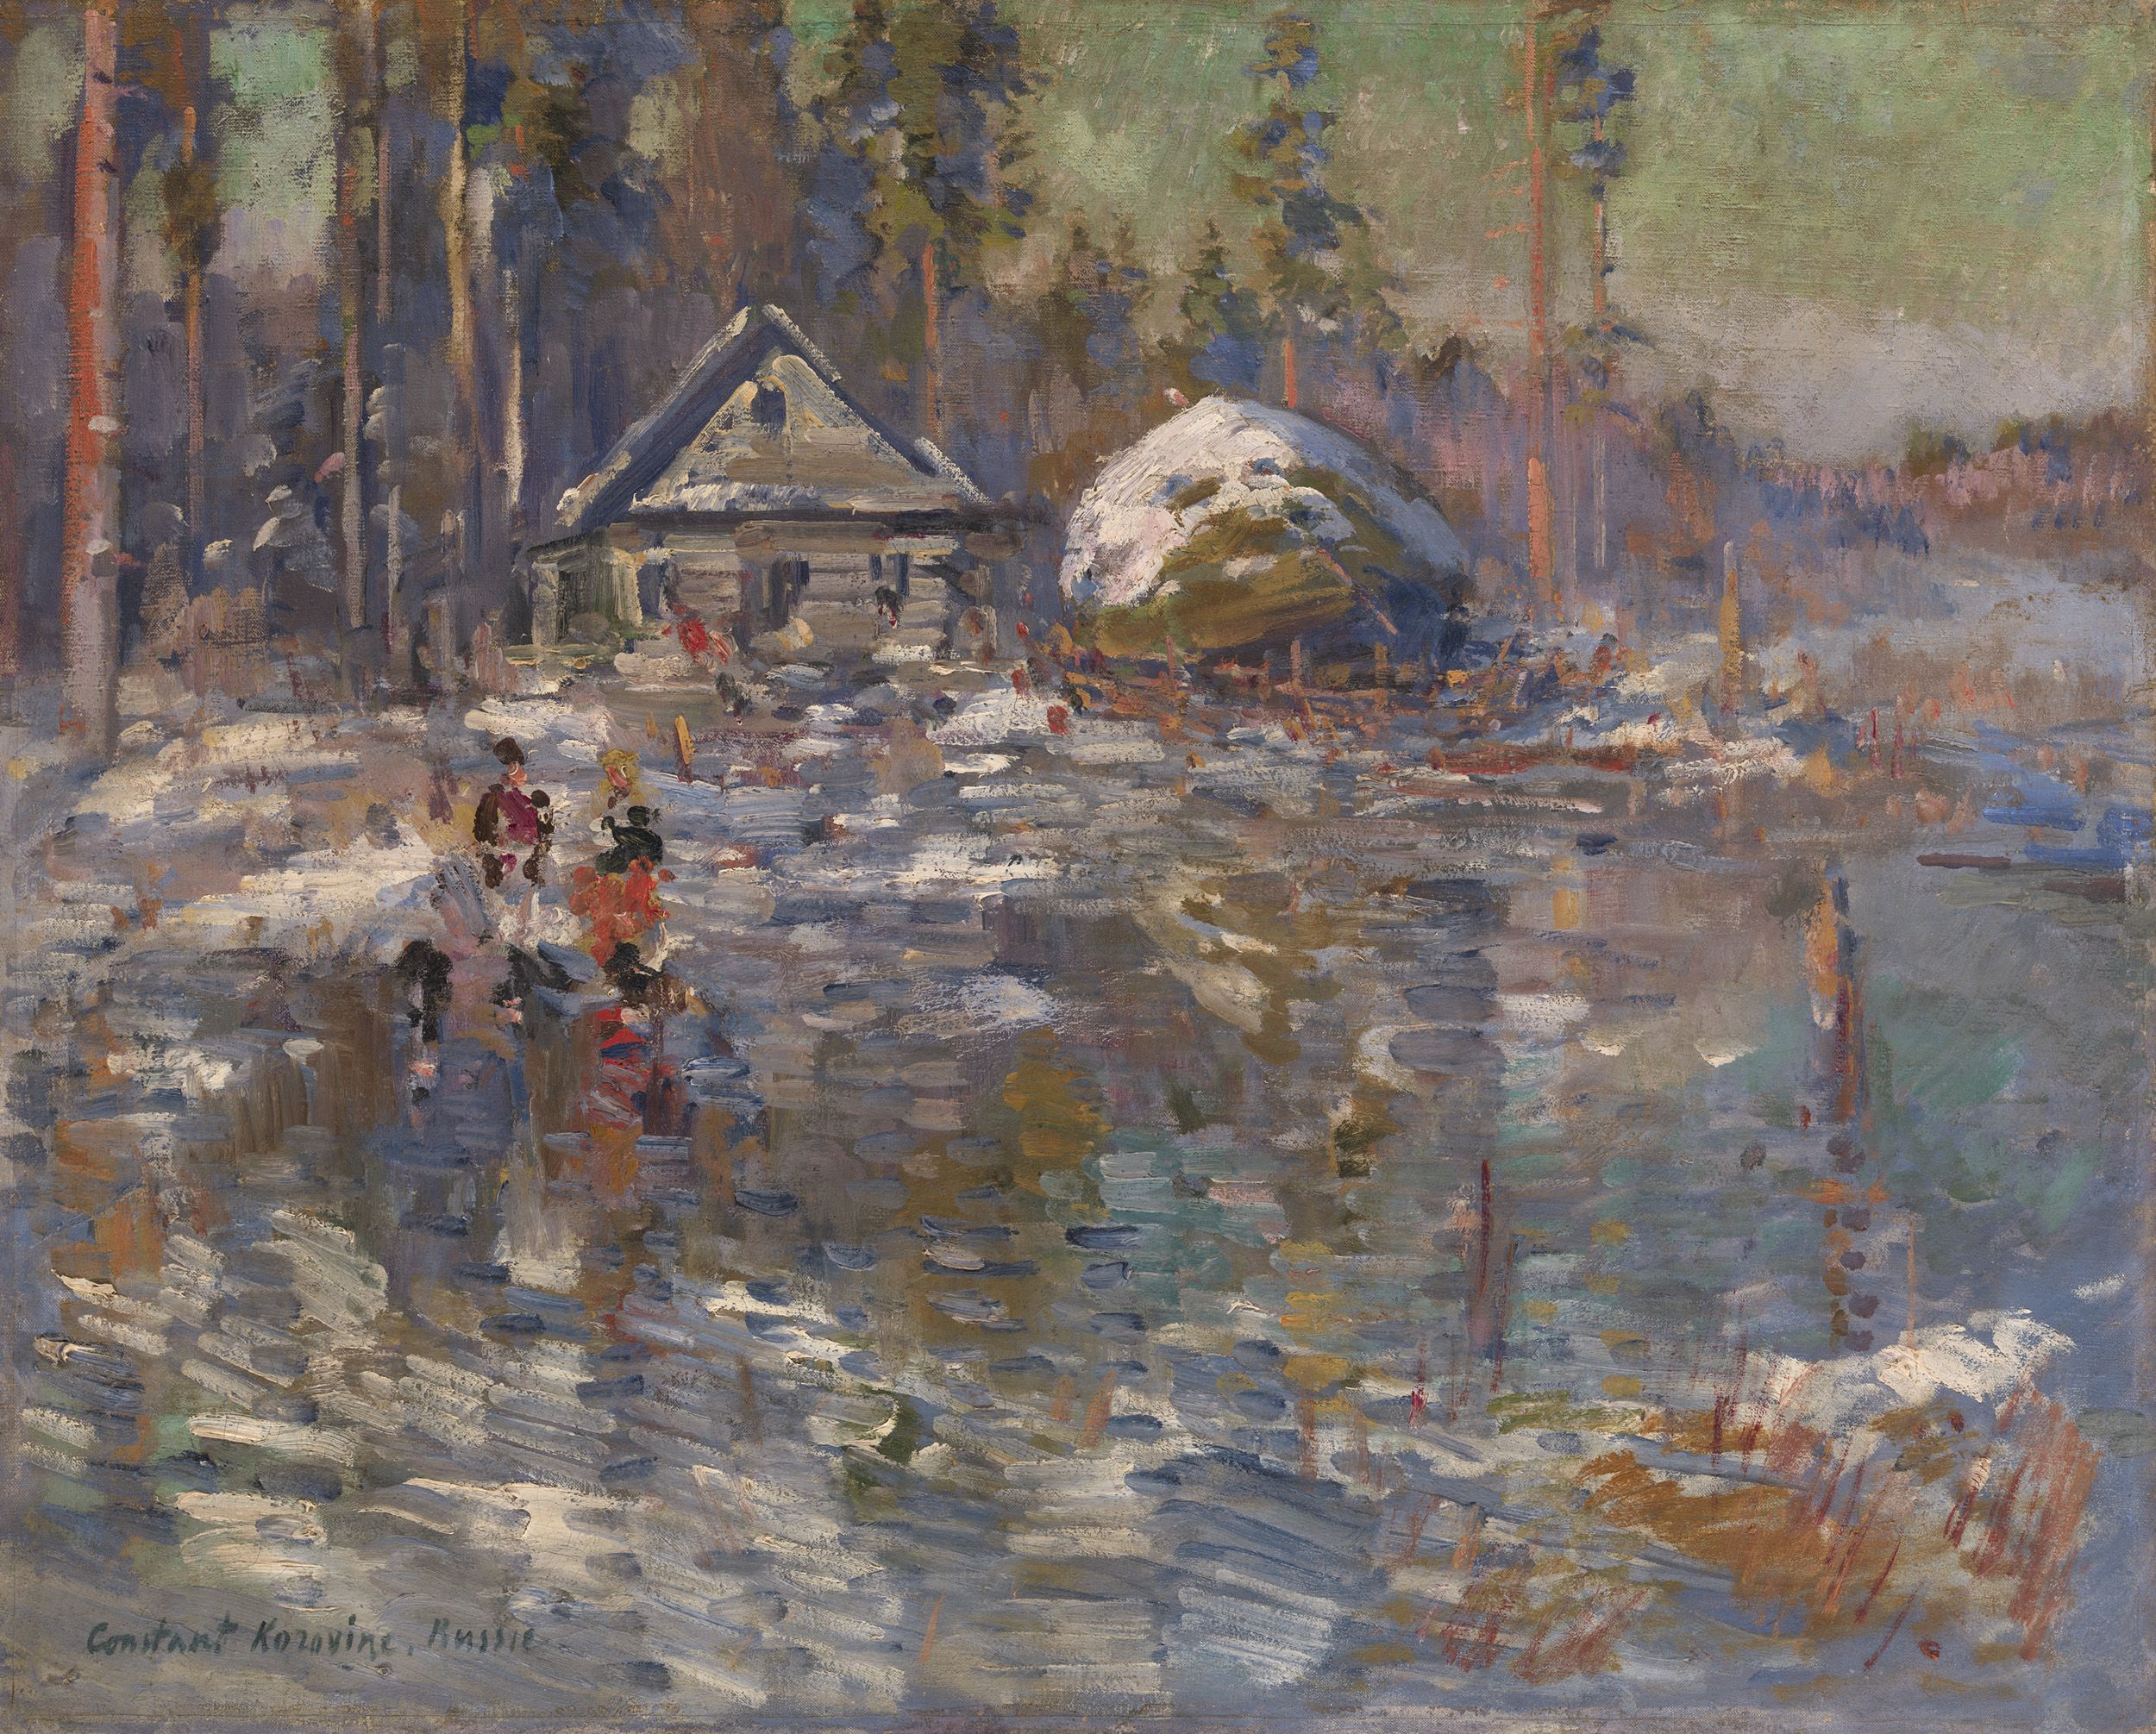 Lot 16 Konstantin Korovin, Frozen Lake